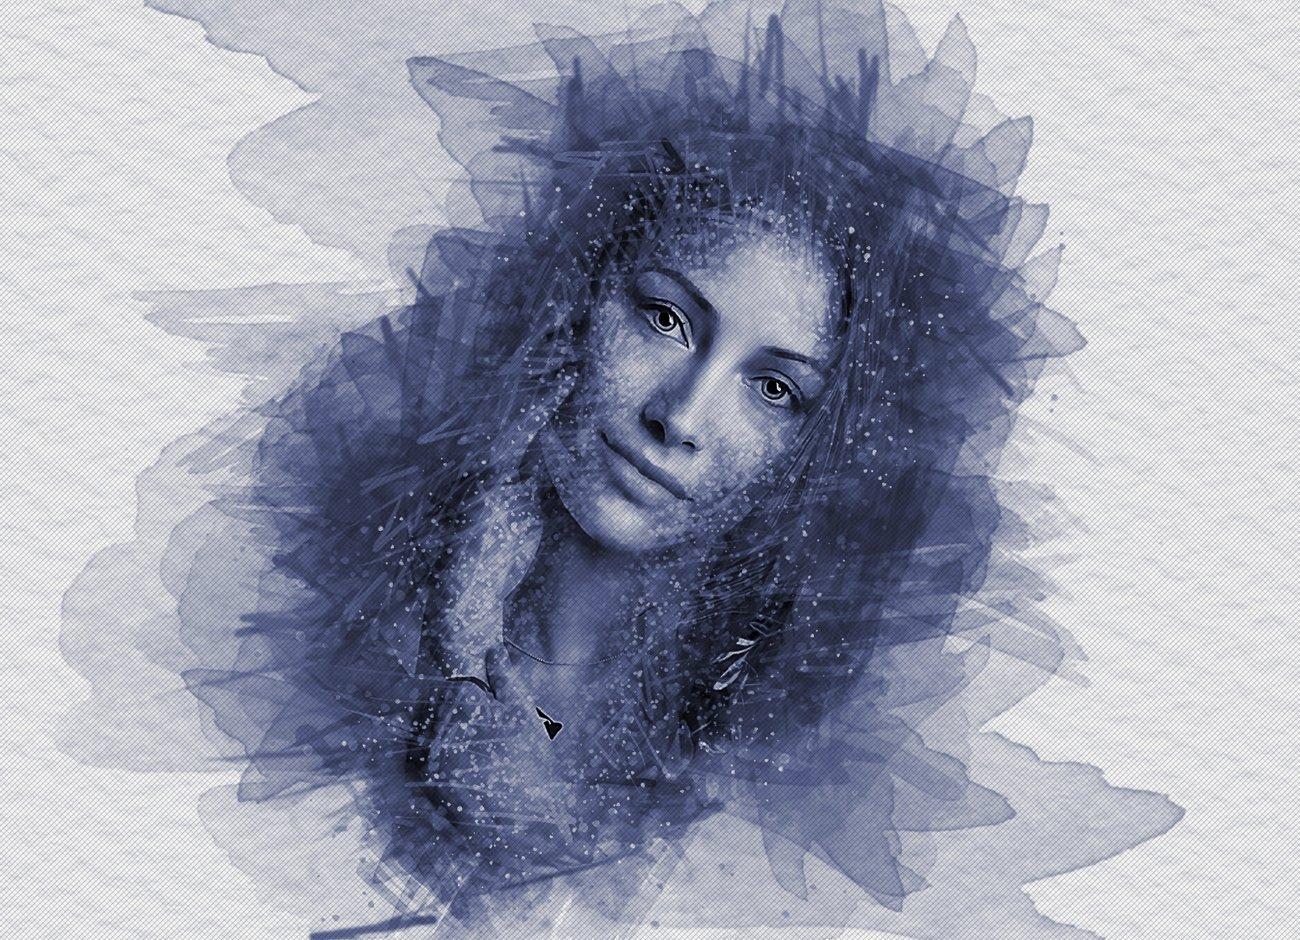 逼真水彩画效果照片处理特效PS动作模板 Watercolor Photoshop Action插图6